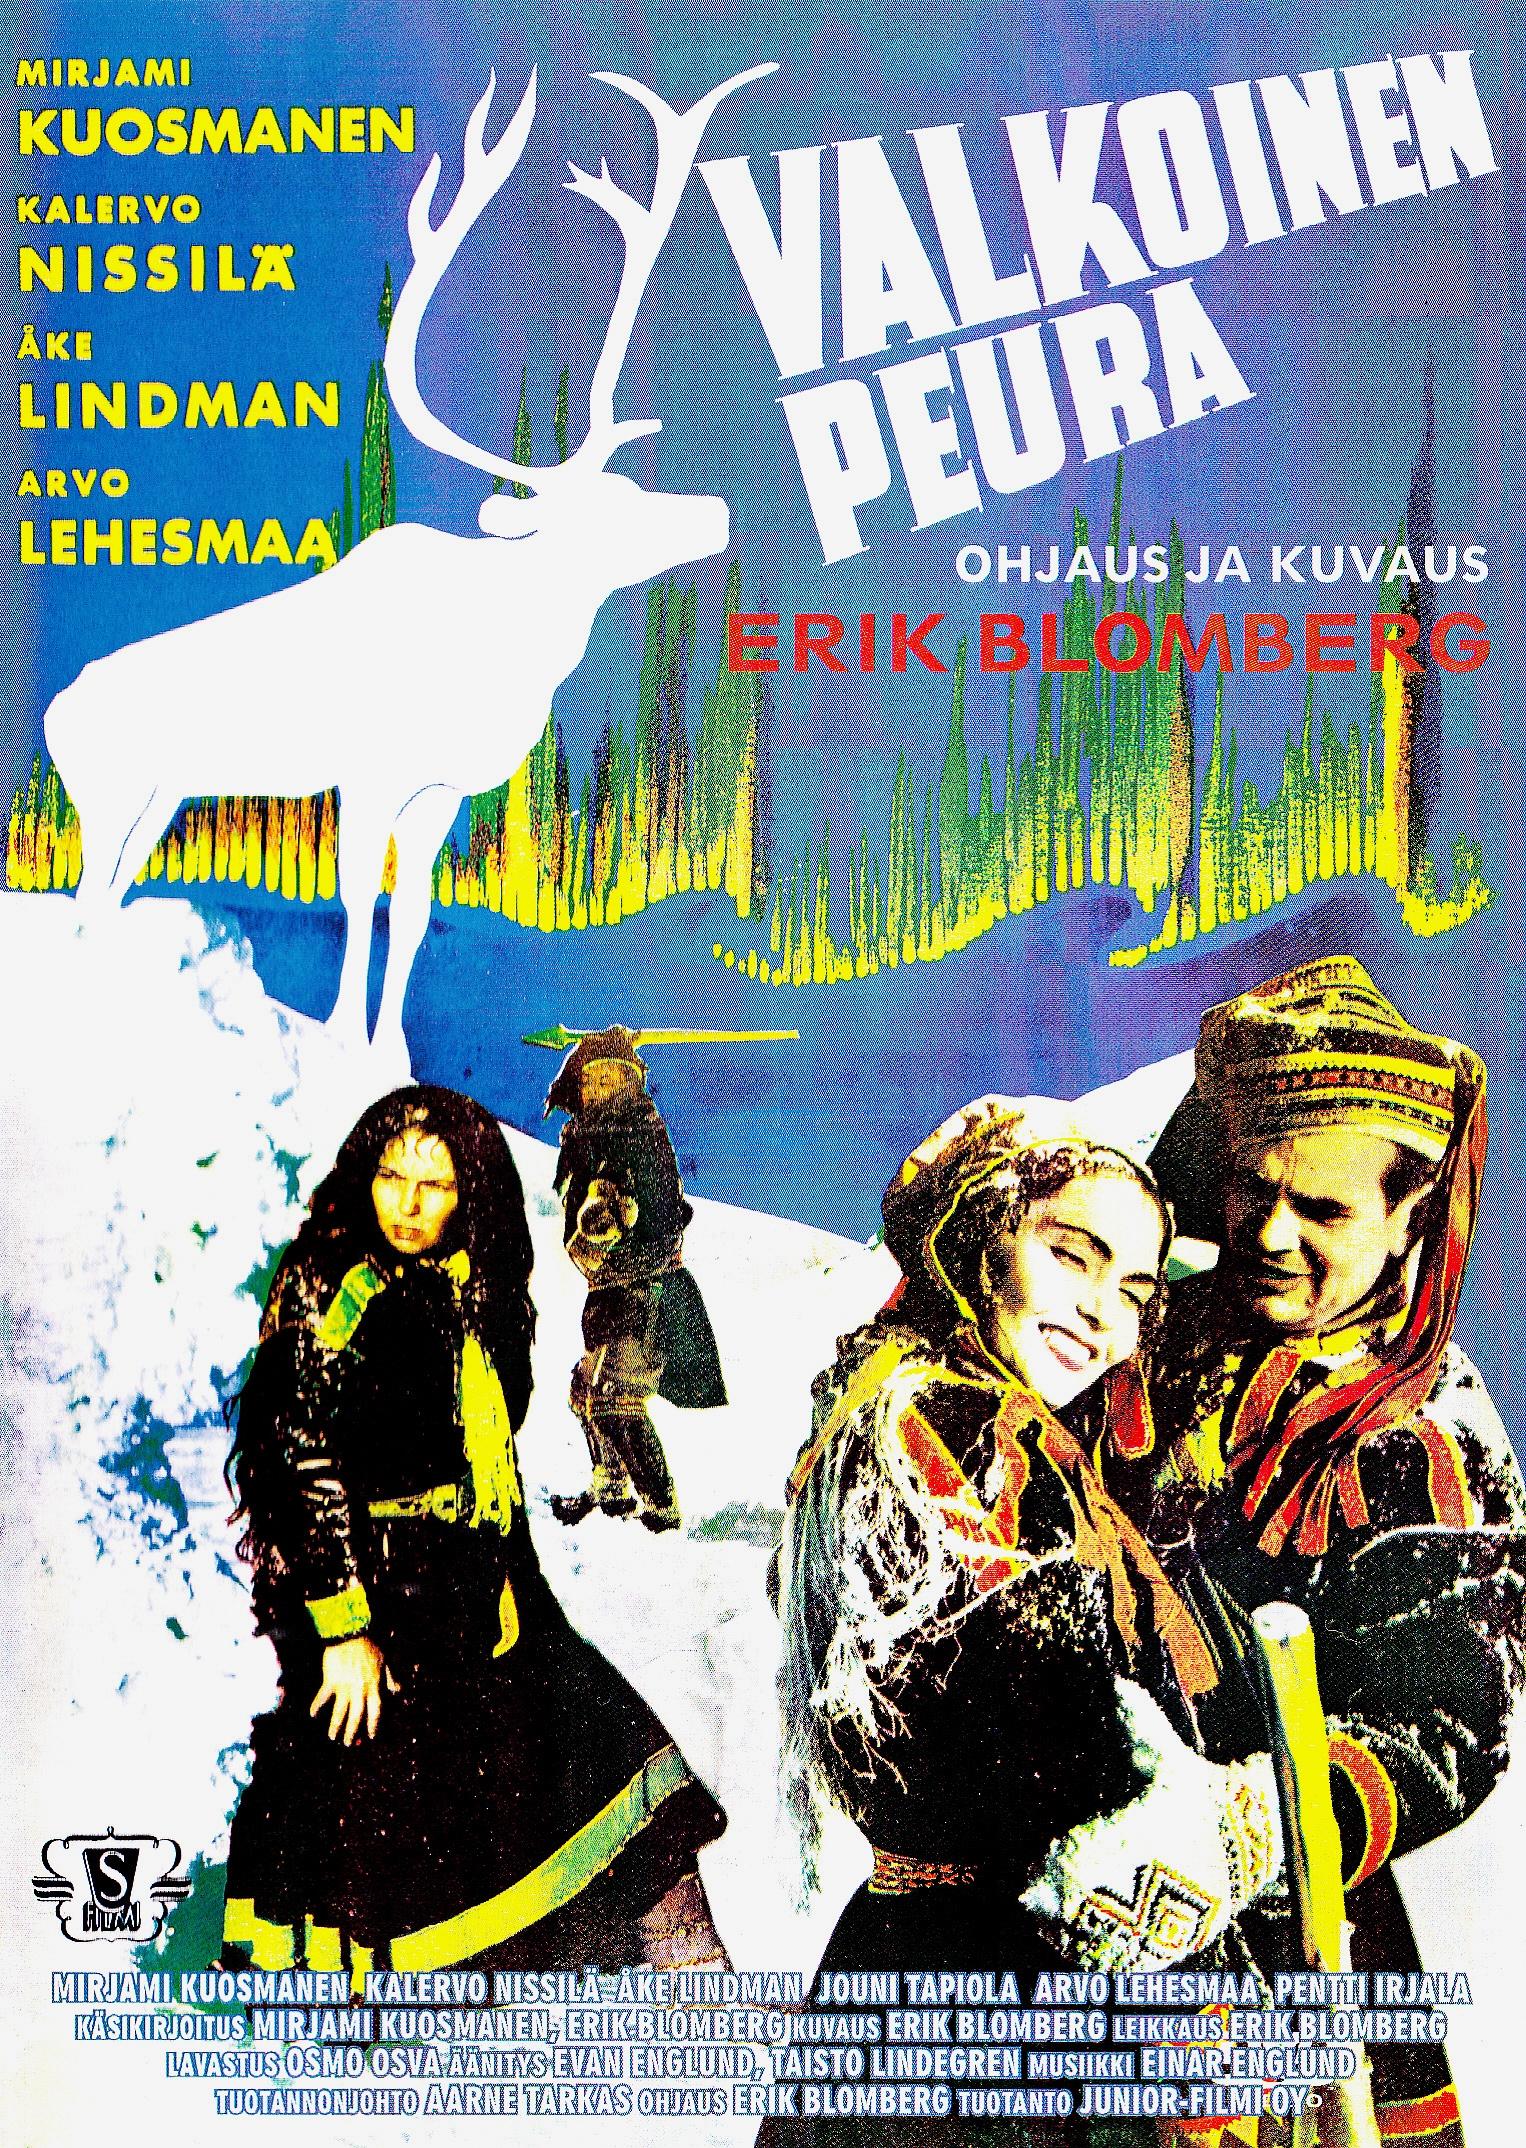 Valkoinen_peura_DVD.jpg